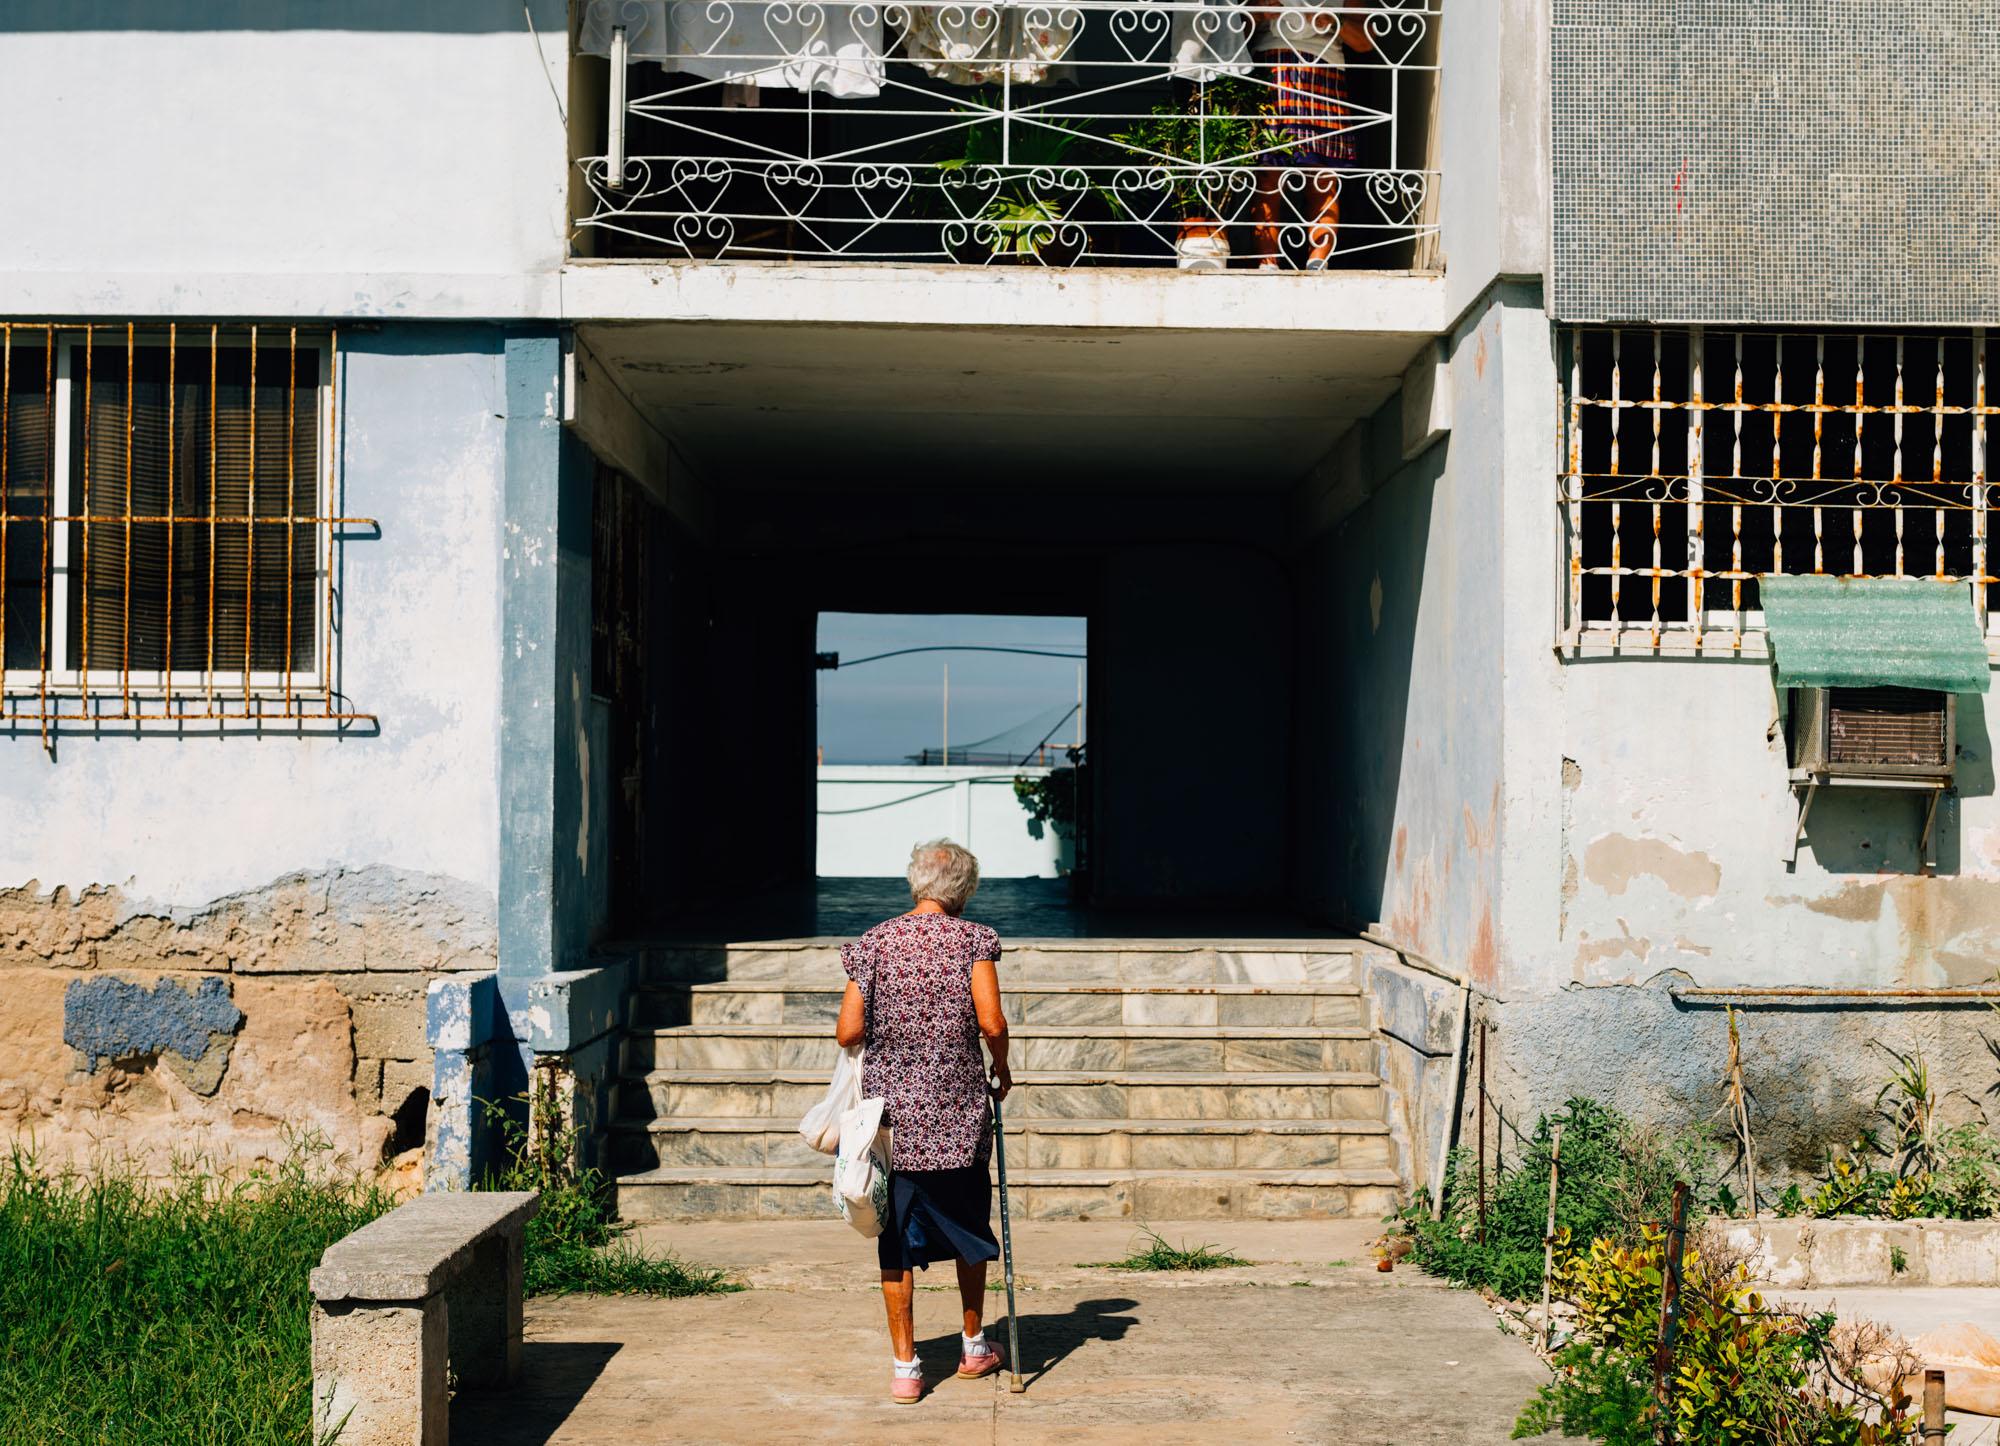 to-be-determined-photo-rhetoric-havana-cuba-115.jpg